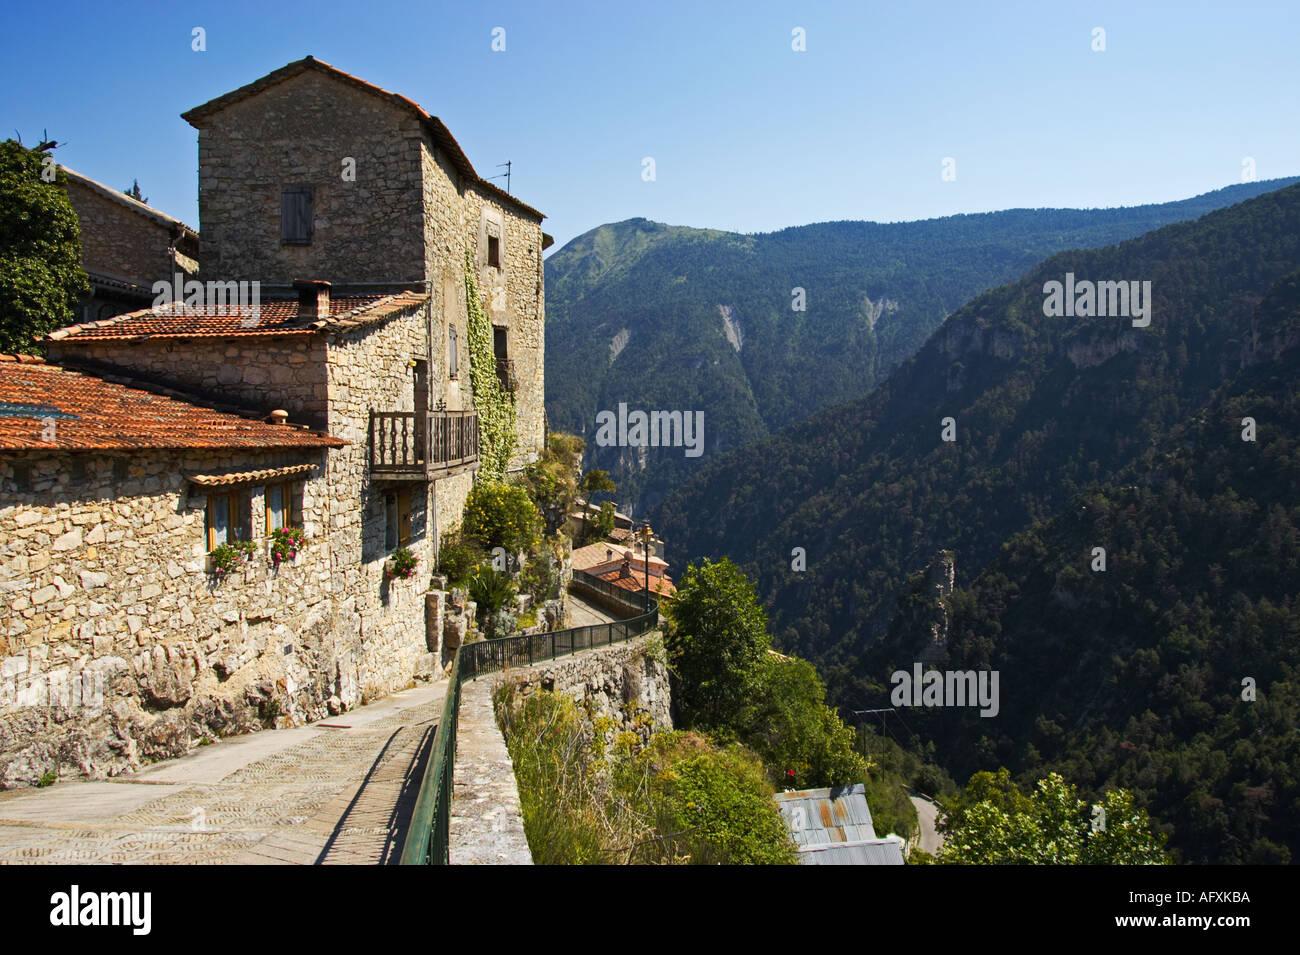 Remote hilltop village of Bairols, Alpes Maritimes, France - Stock Image